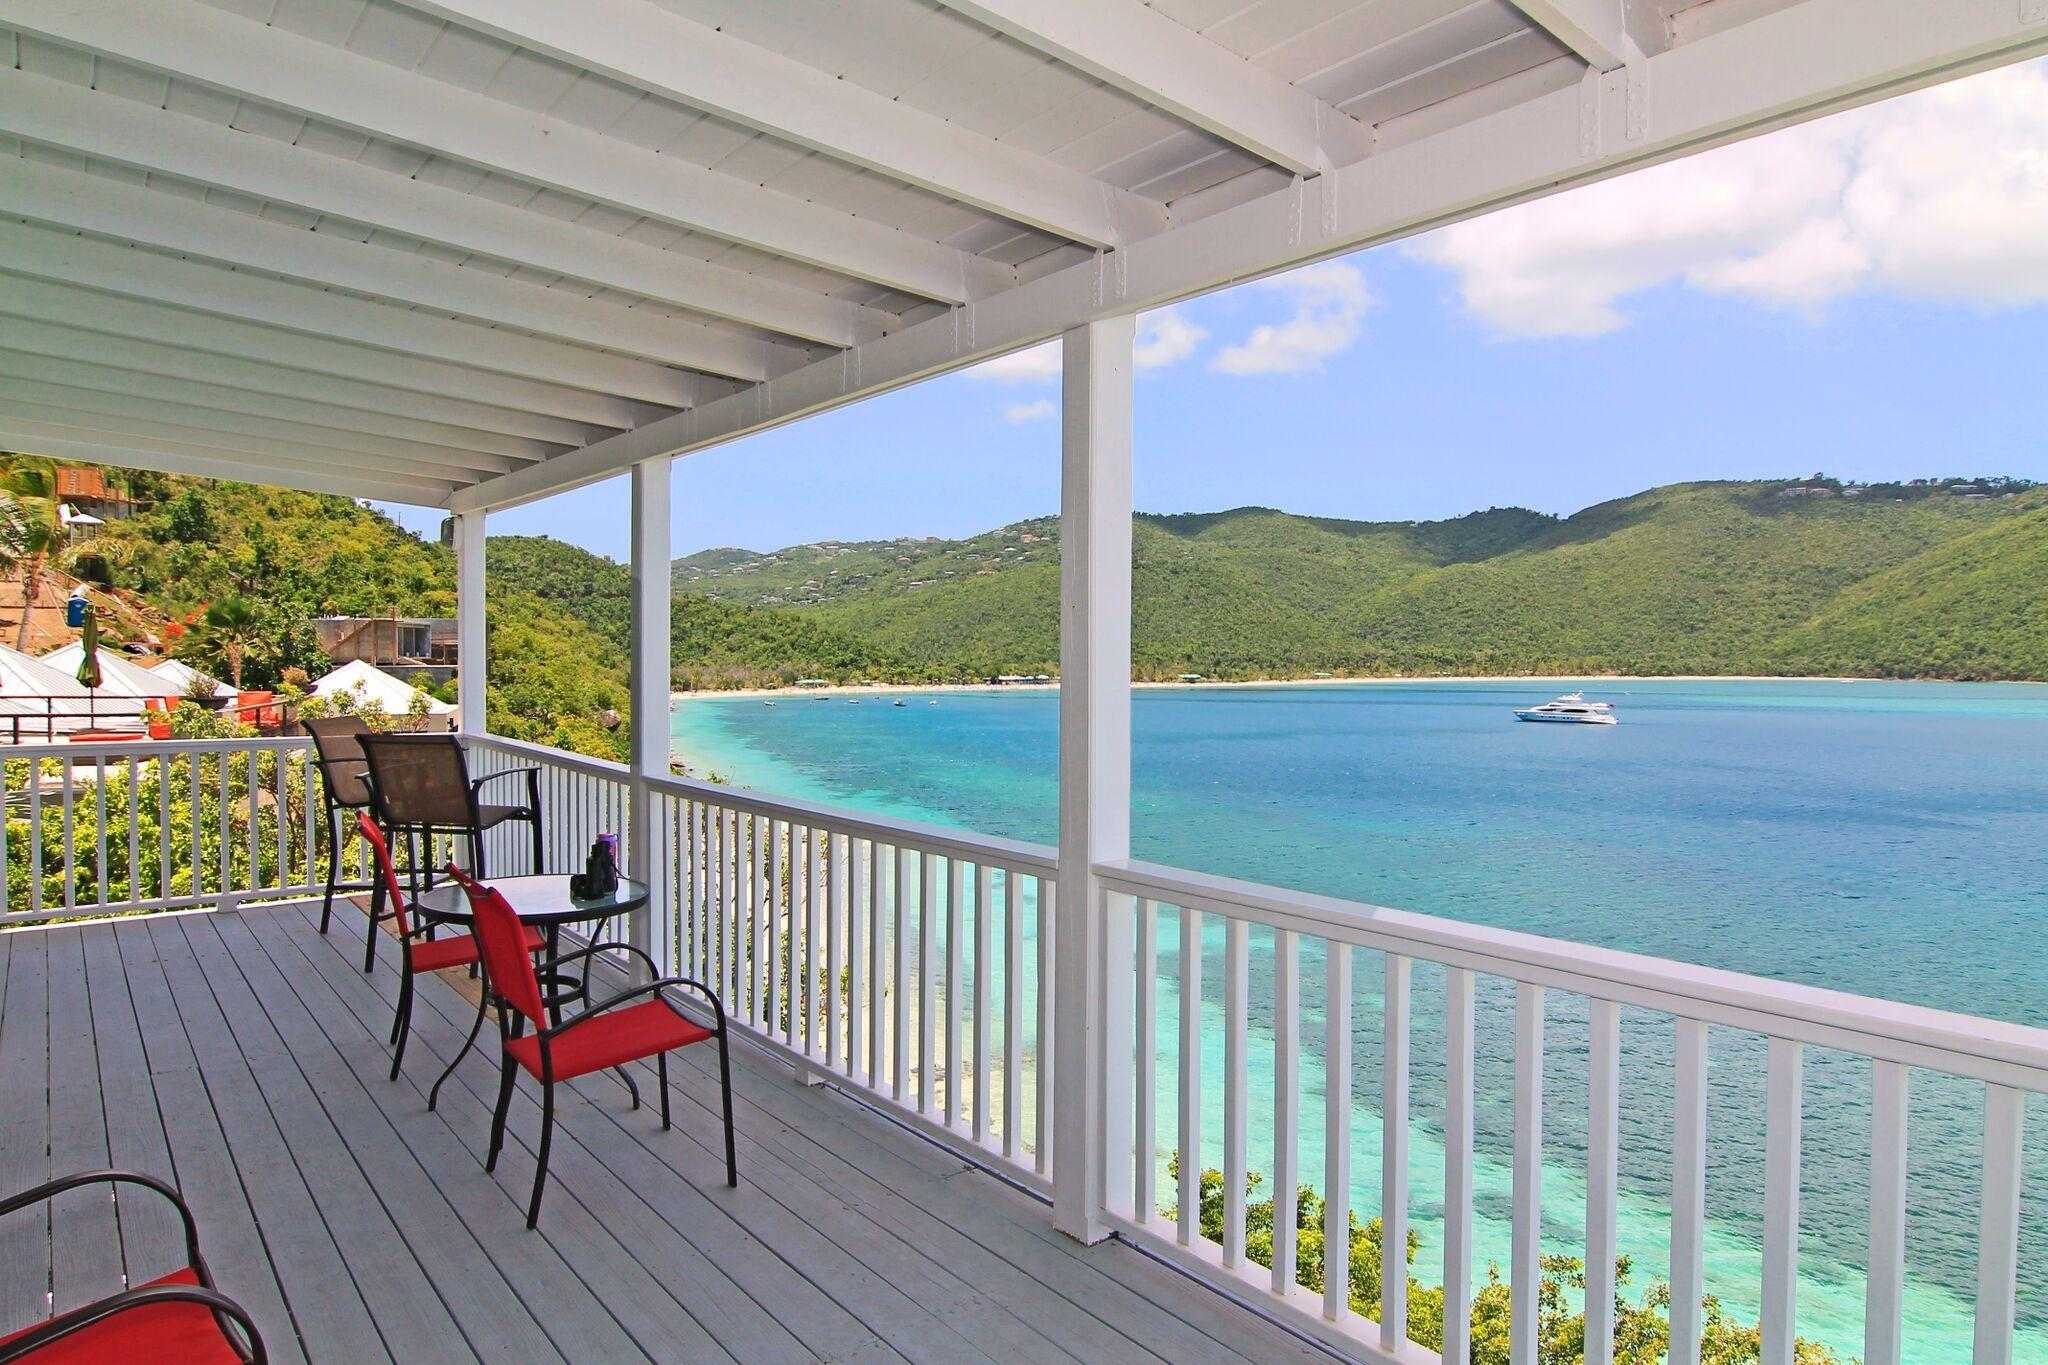 Lower deck by beach